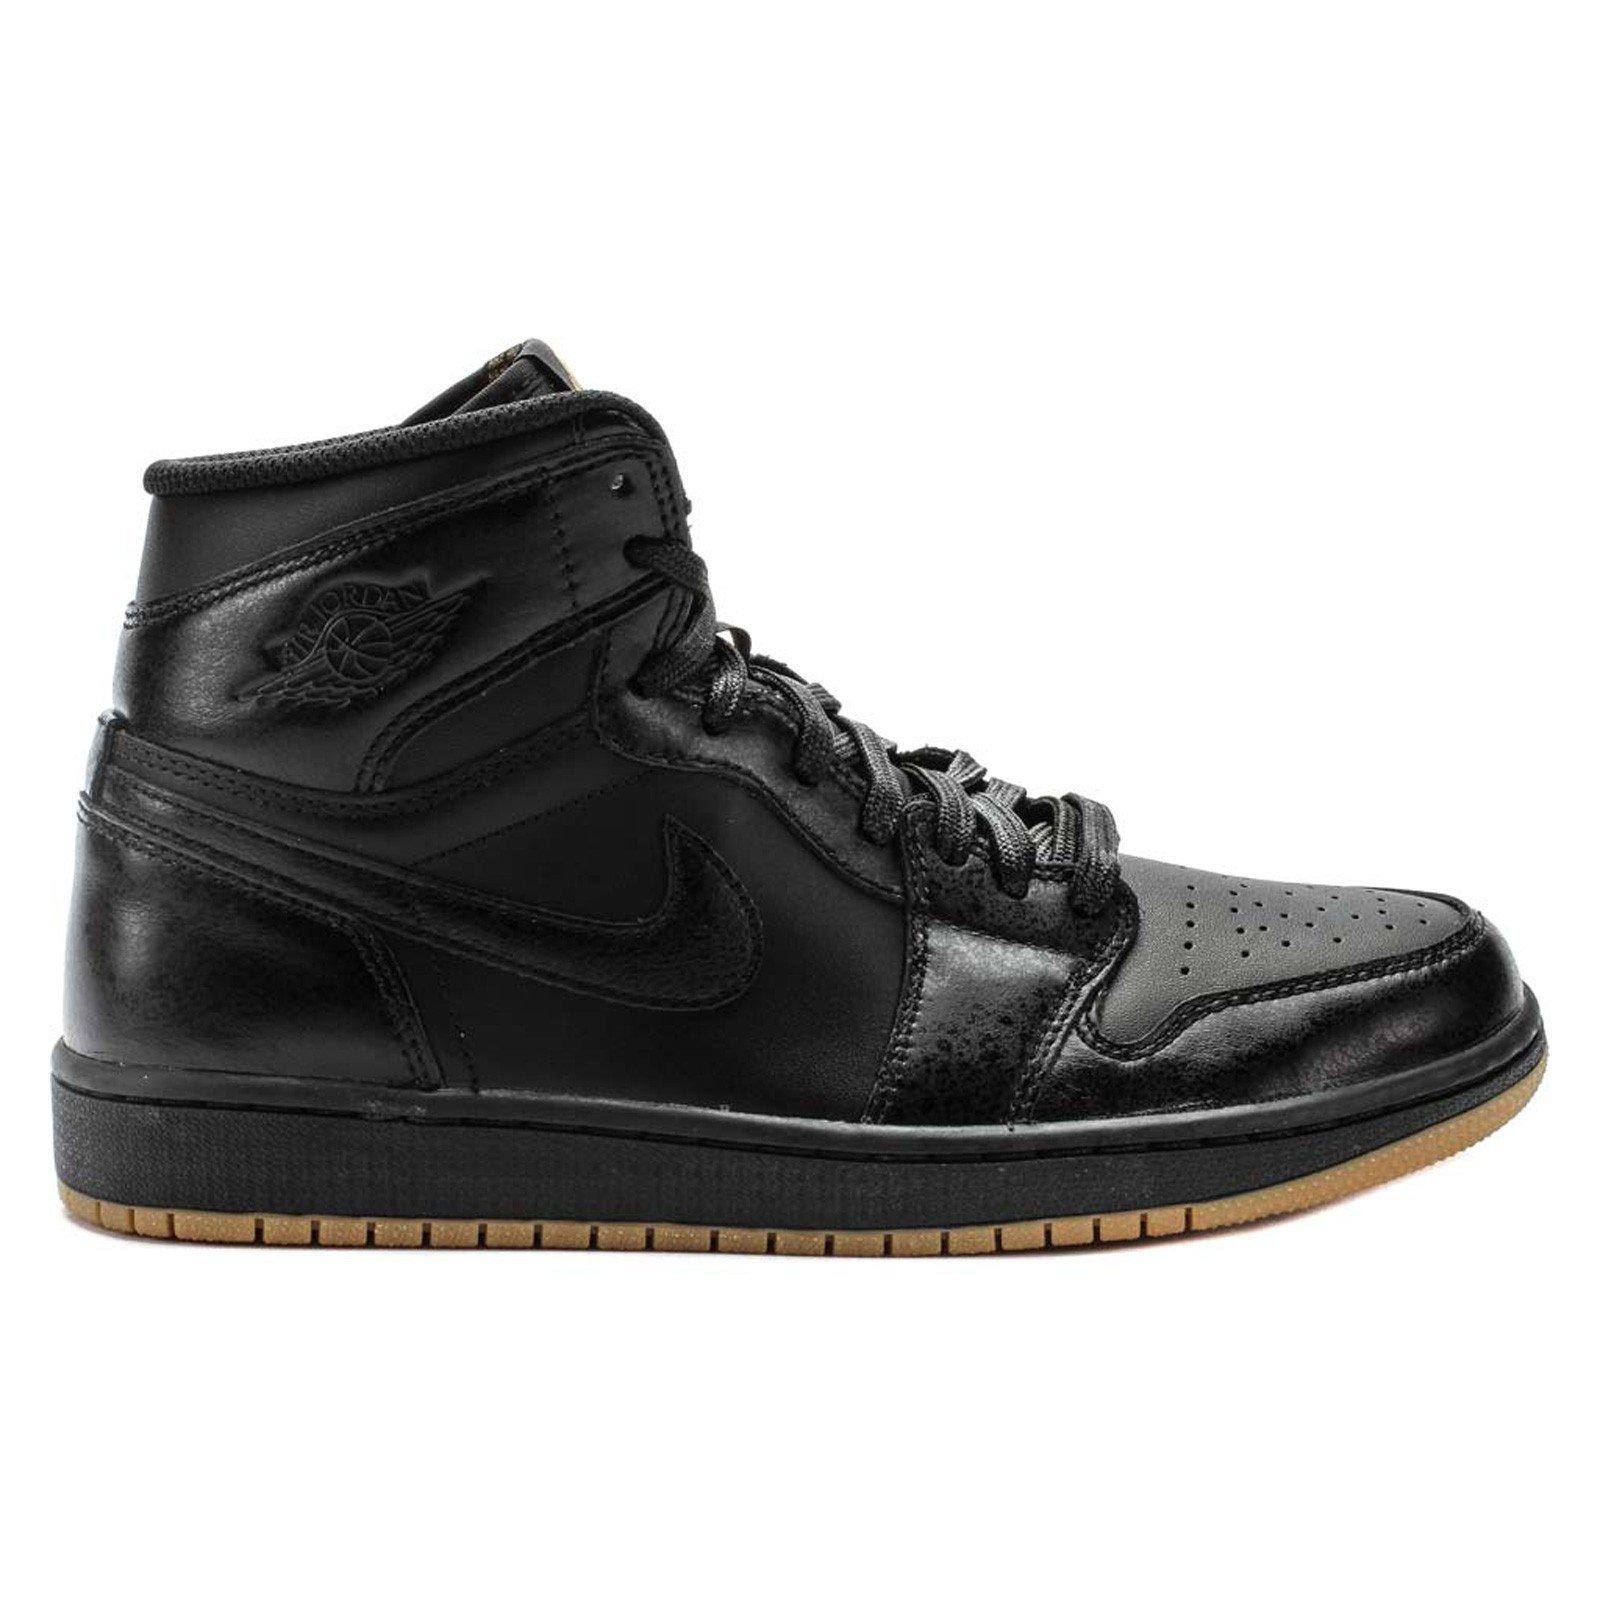 Nike Air Jordan 1 RETRO High OG Basketball Shoes black, EU Shoe Size:EUR 36 by Jordan